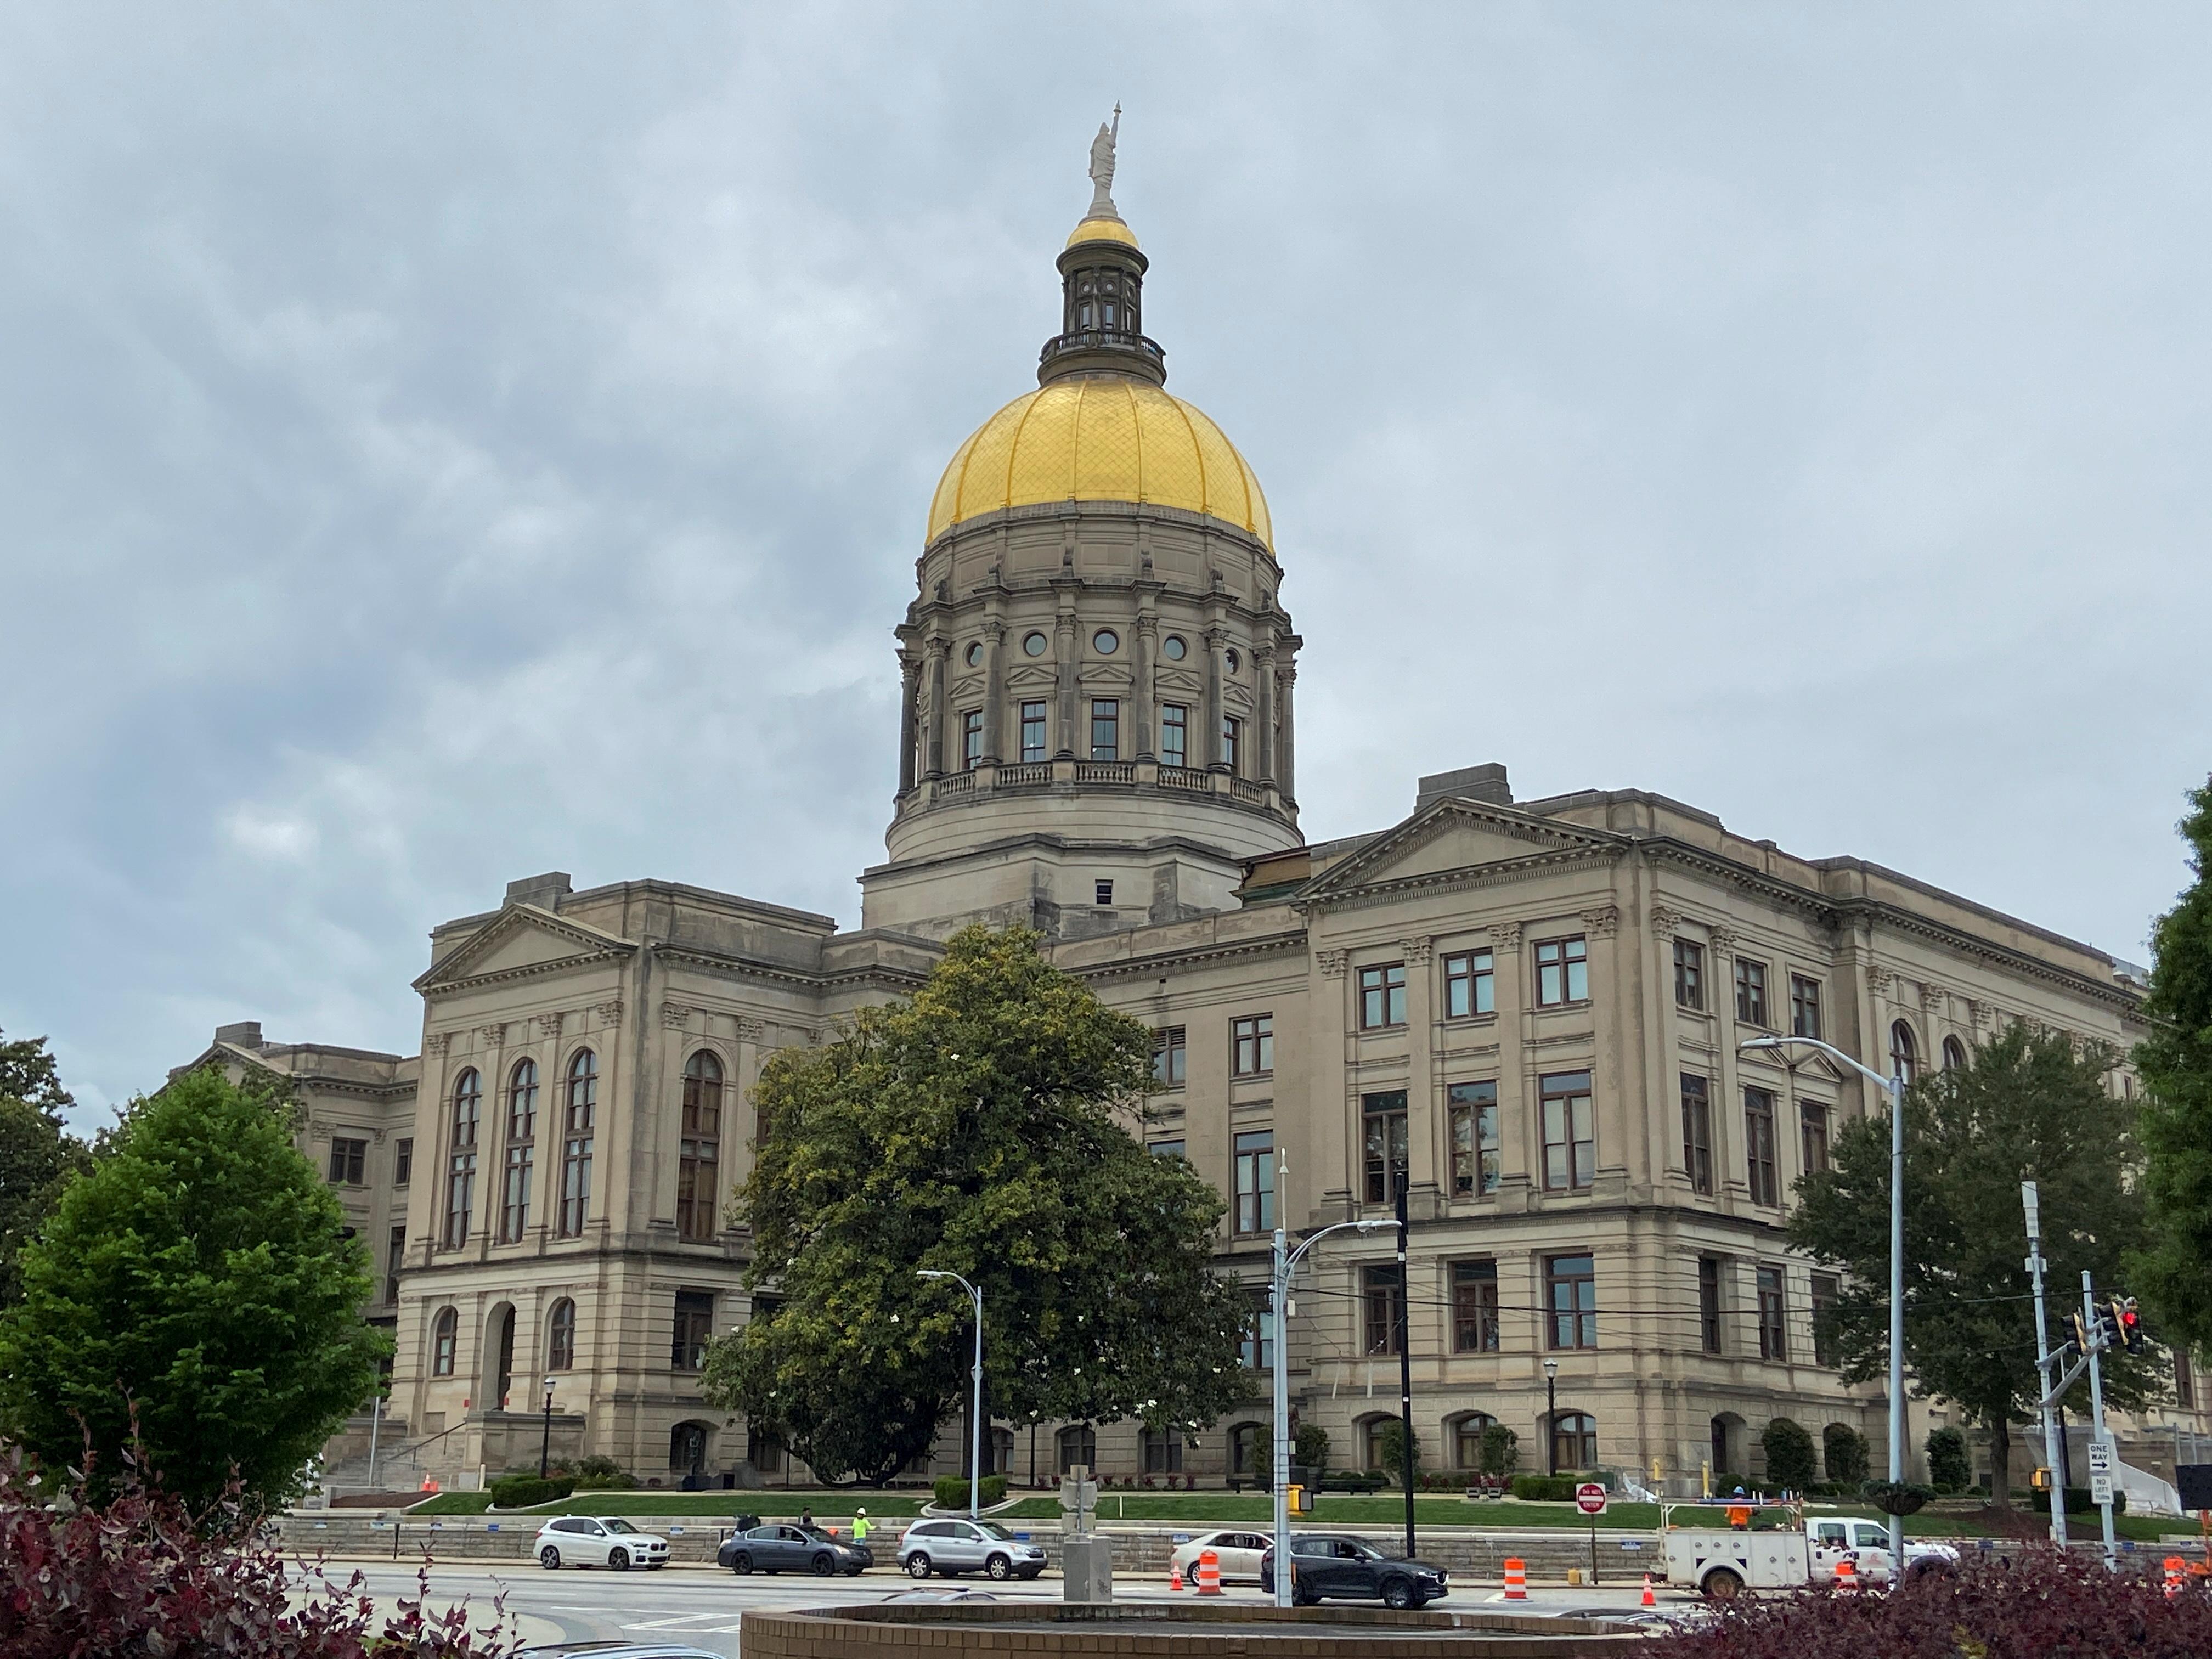 A view of the Georgia State Capitol in Atlanta, Georgia. REUTERS/Linda So